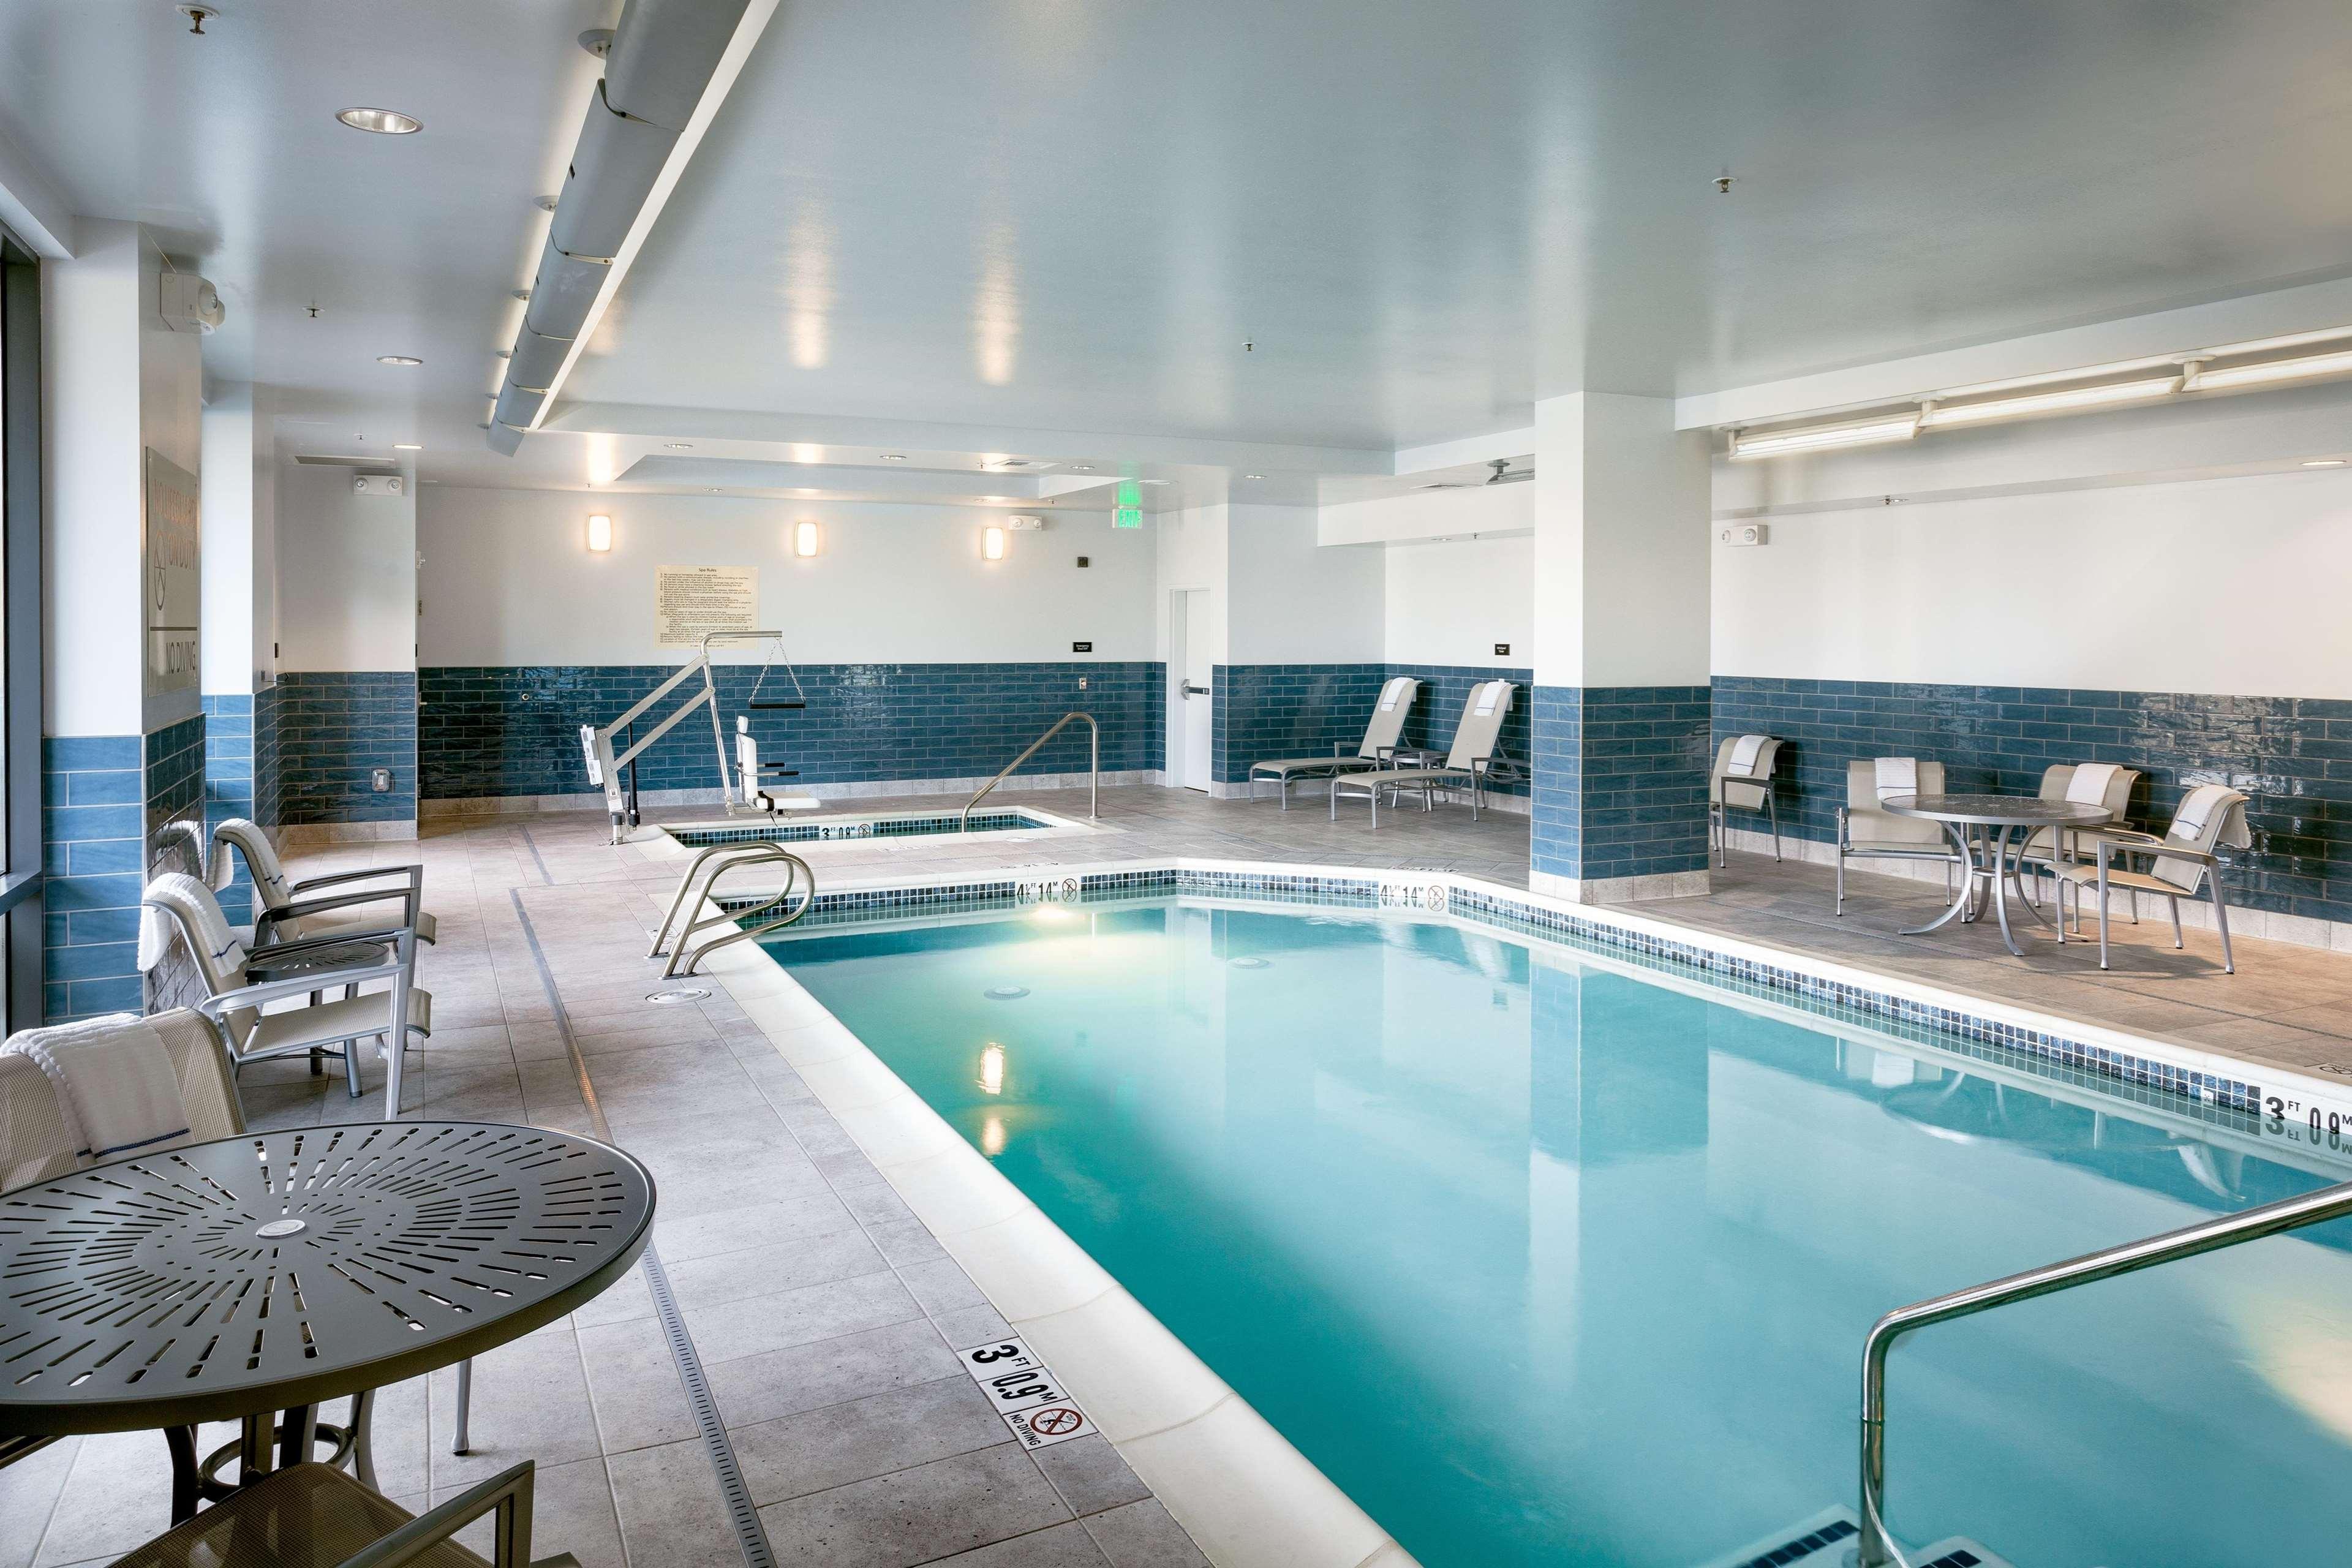 Hampton Inn & Suites by Hilton Seattle/Northgate image 36